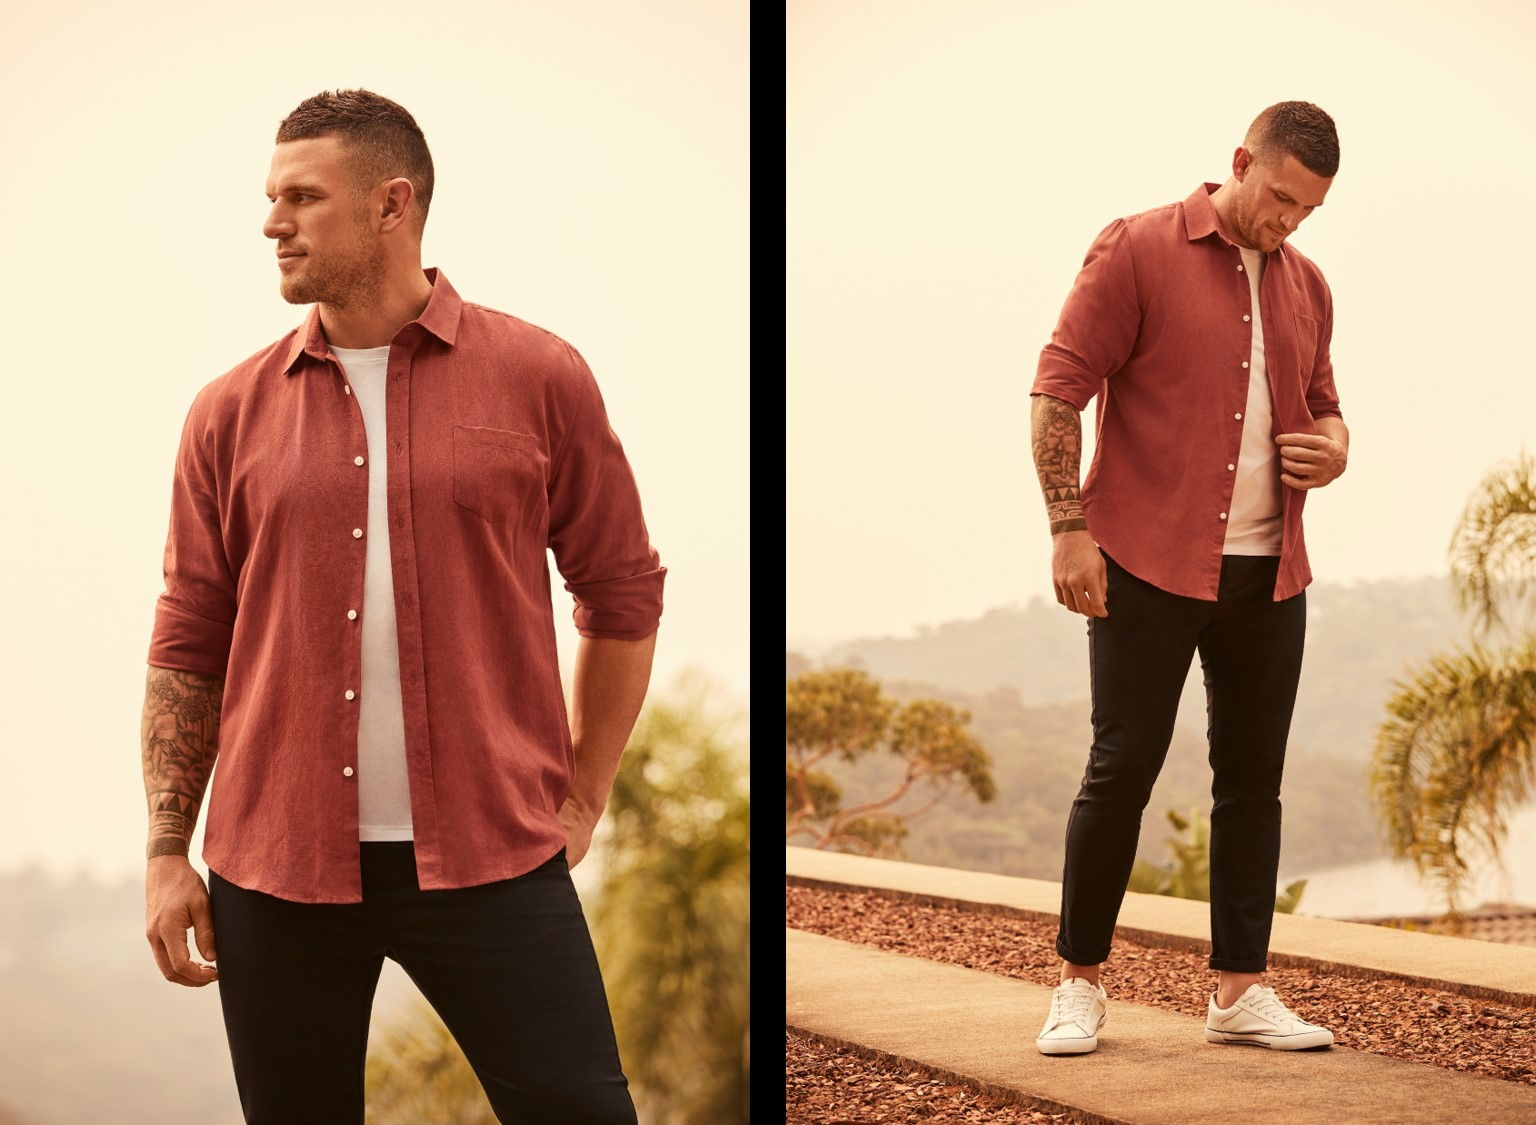 Bridge Models' Luke Burges in the Johnny Bigg Autumn Campaign 2020